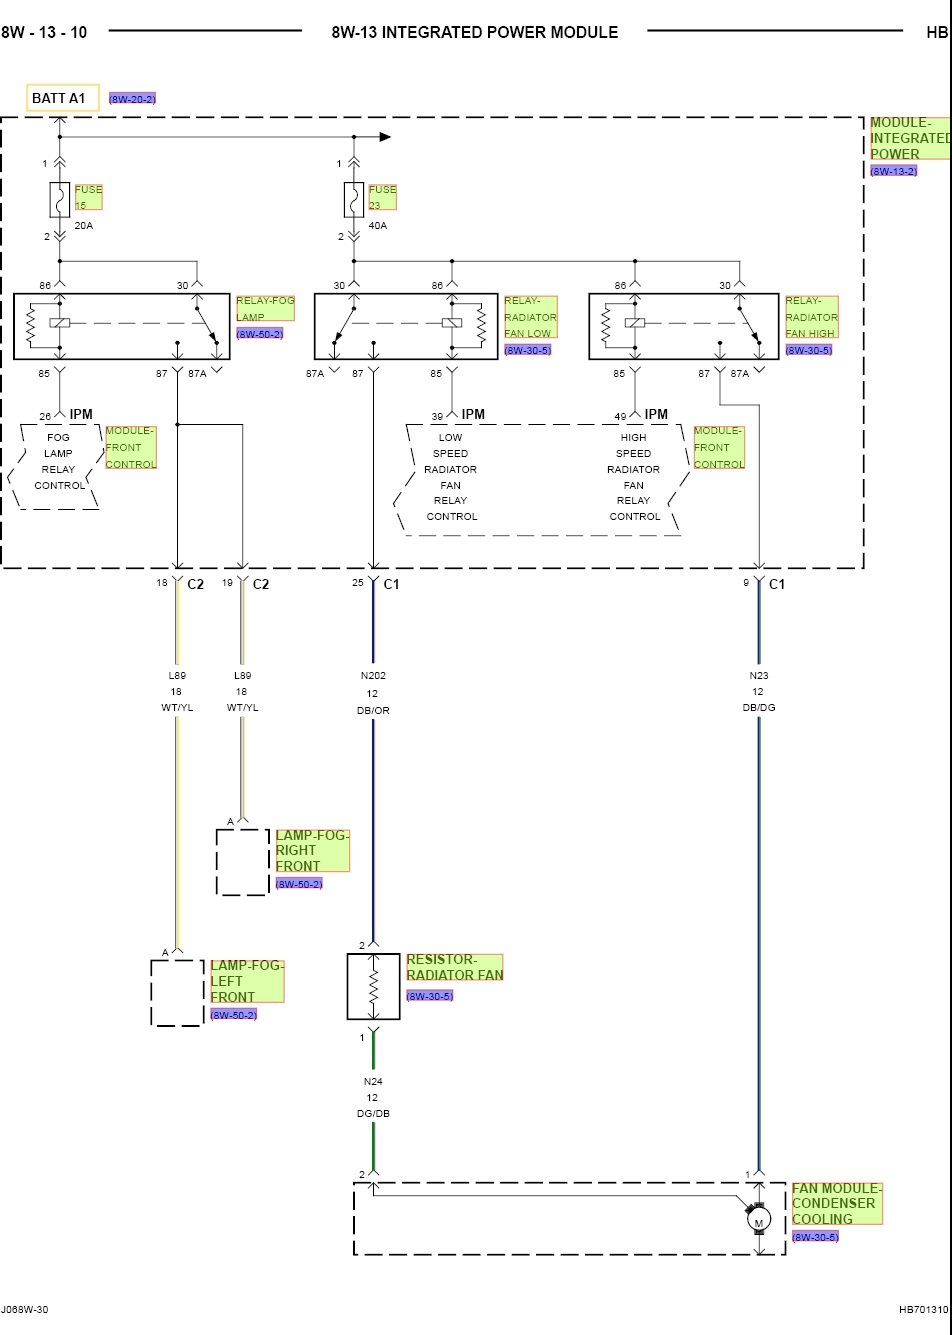 Swell Chrysler Aspen Wiring Diagram Online Wiring Diagram Wiring Cloud Domeilariaidewilluminateatxorg